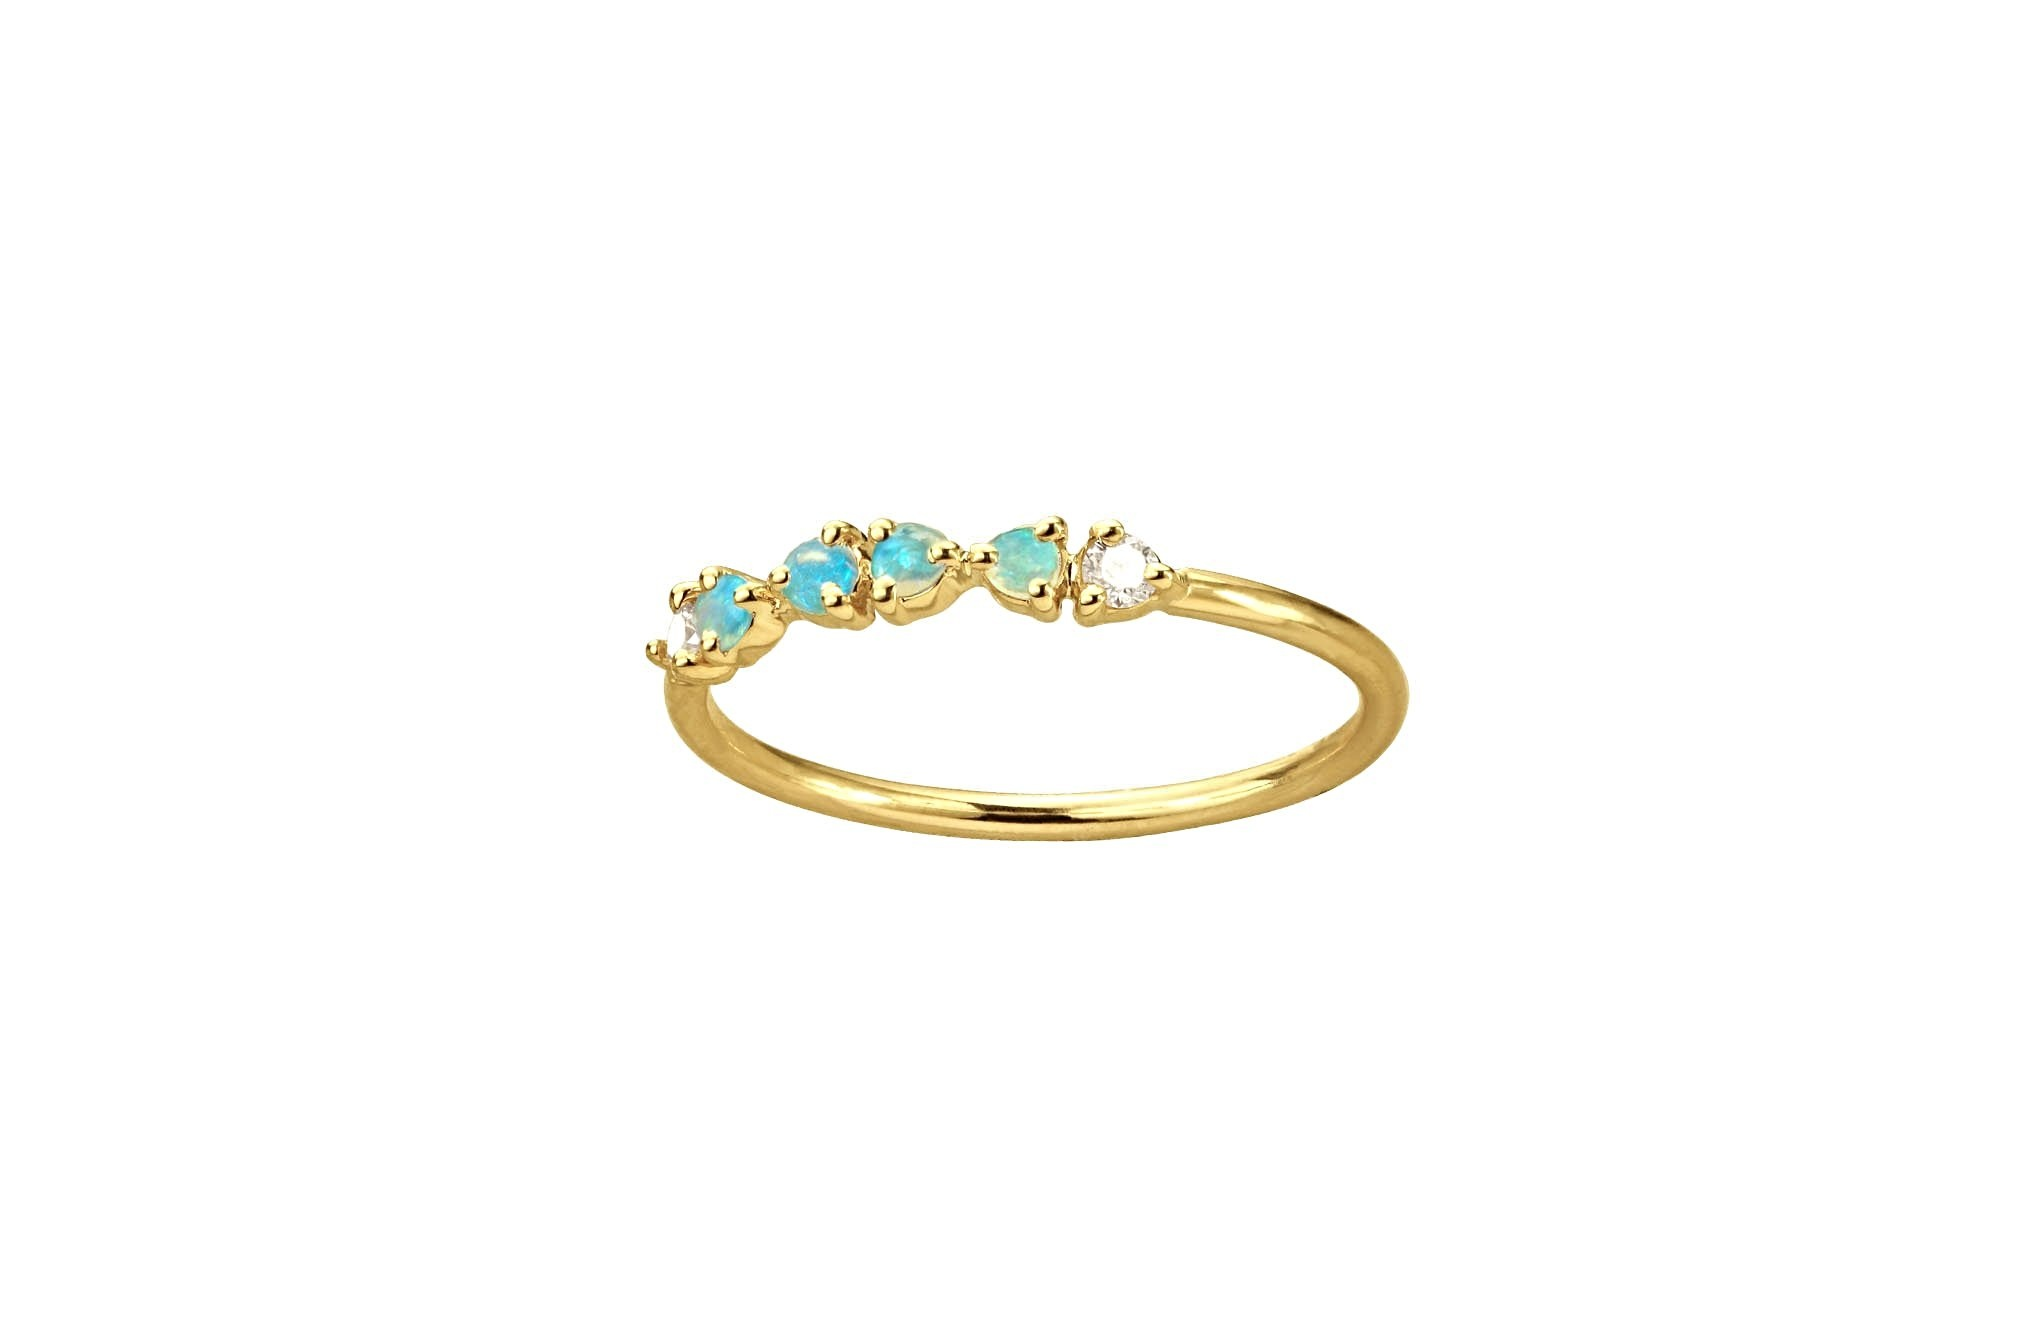 Opal & Diamond Demi Ring, 14kt, size 7.5